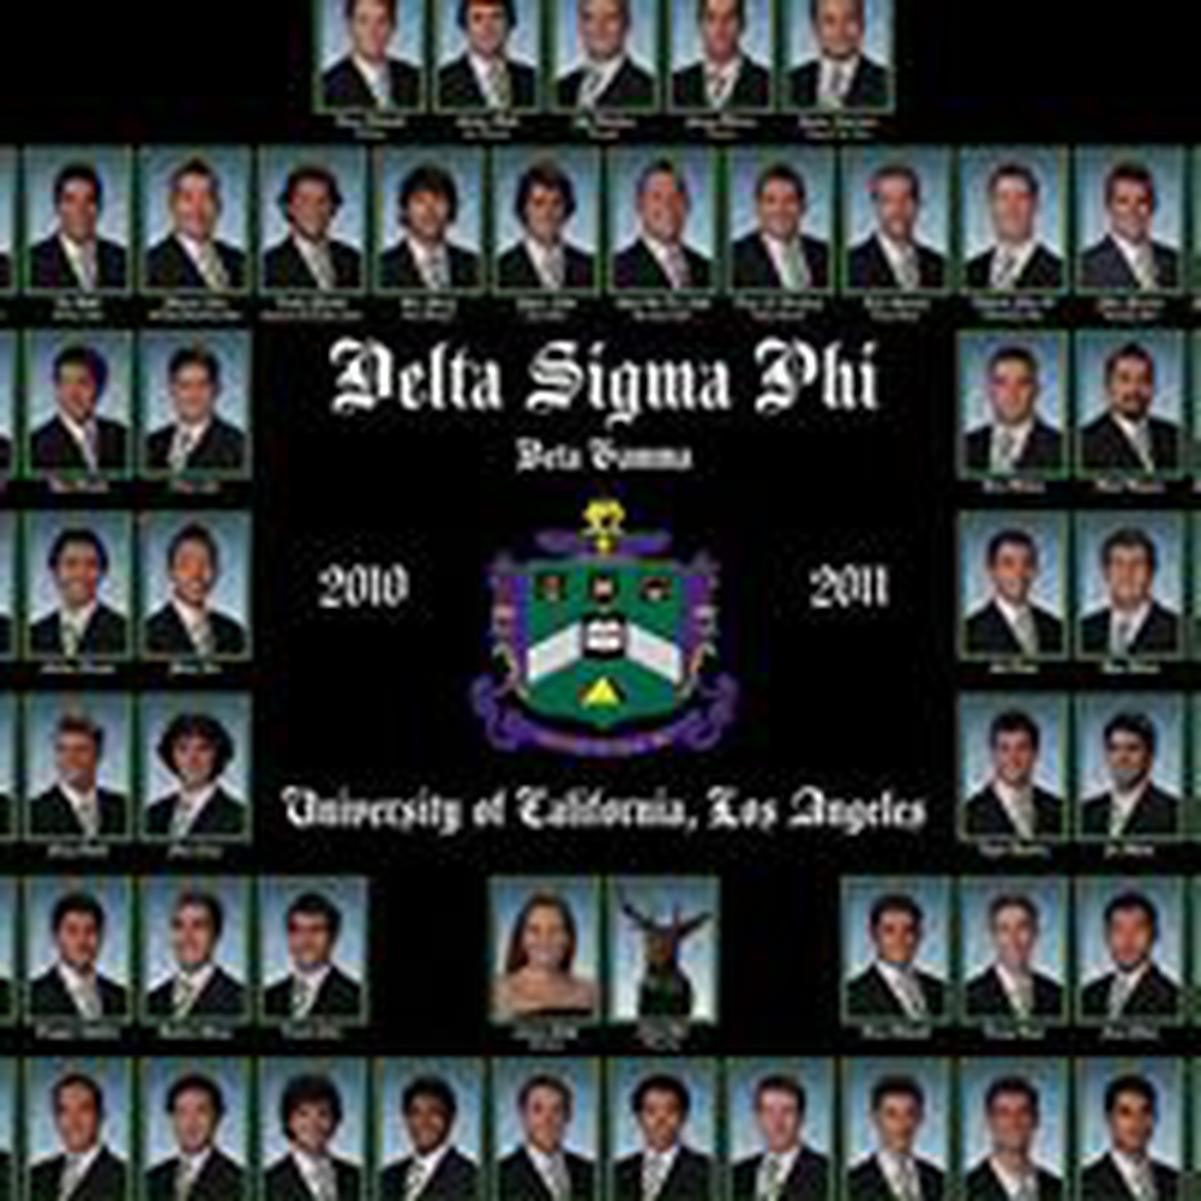 UclaDeltaSigmaPhiLosAngelesCaSportsClubSchoolWikiReviewEveripedia